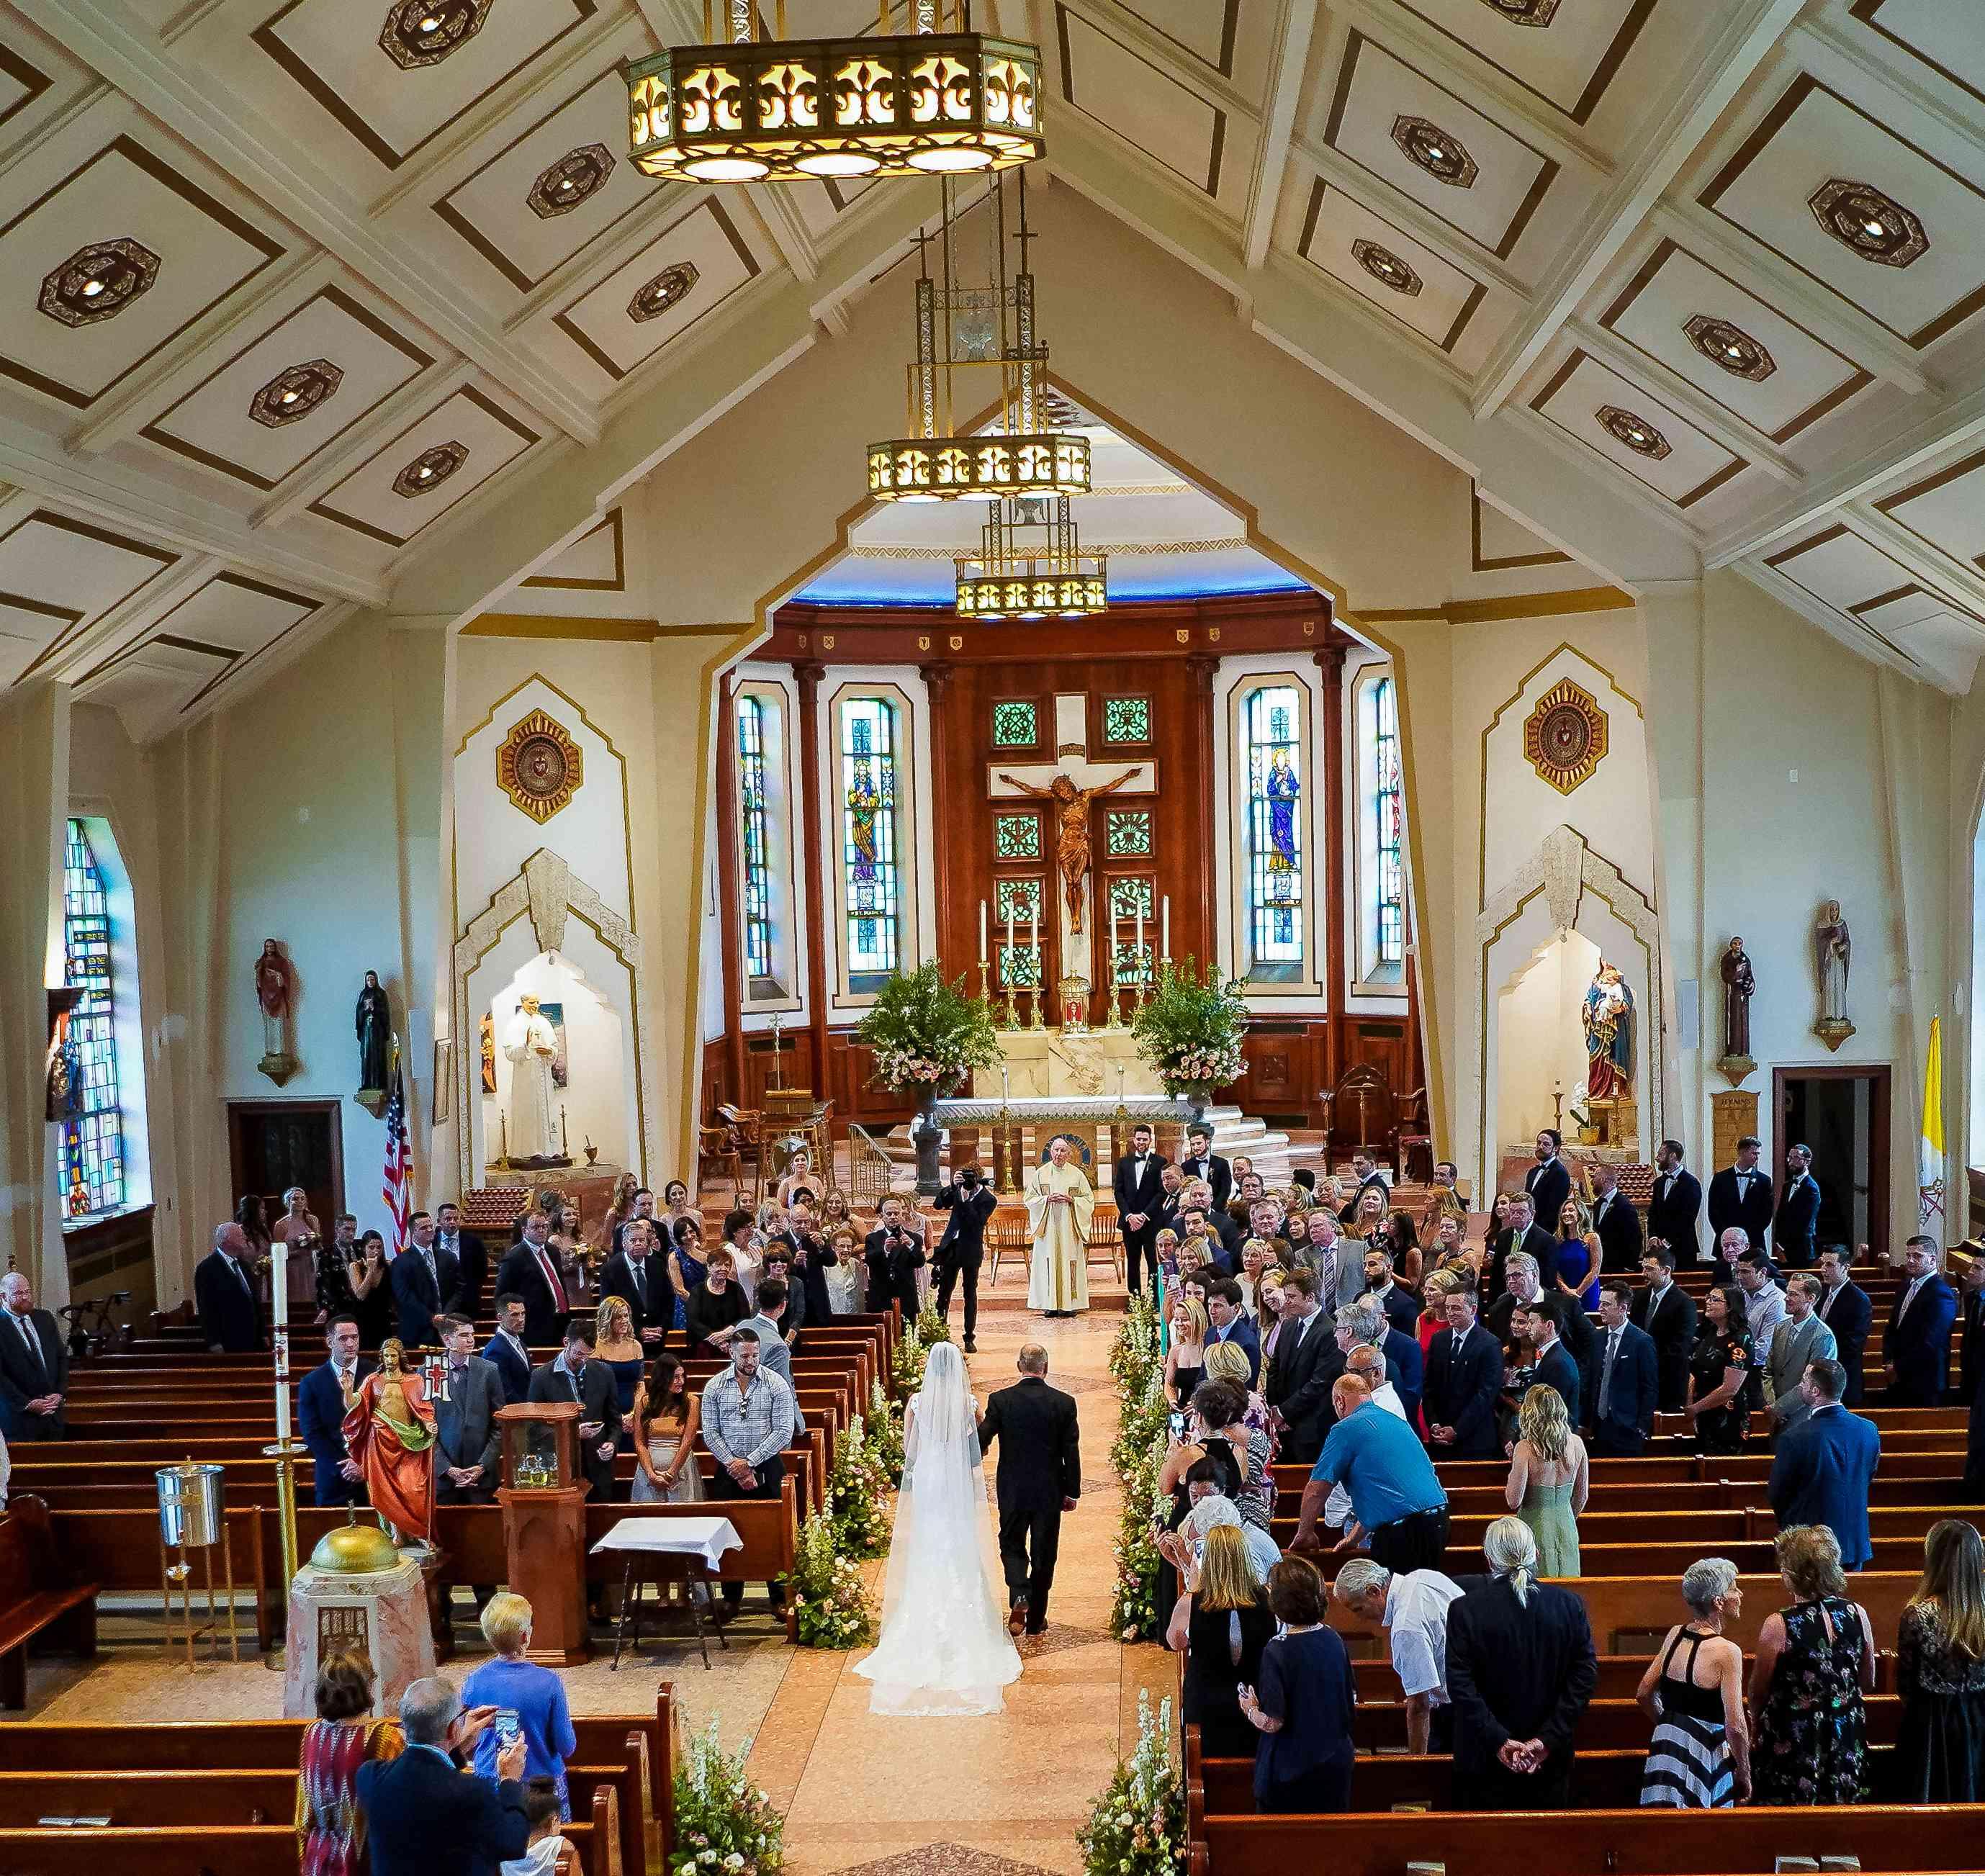 <p>church ceremony bride walking down aisle</p><br><br>